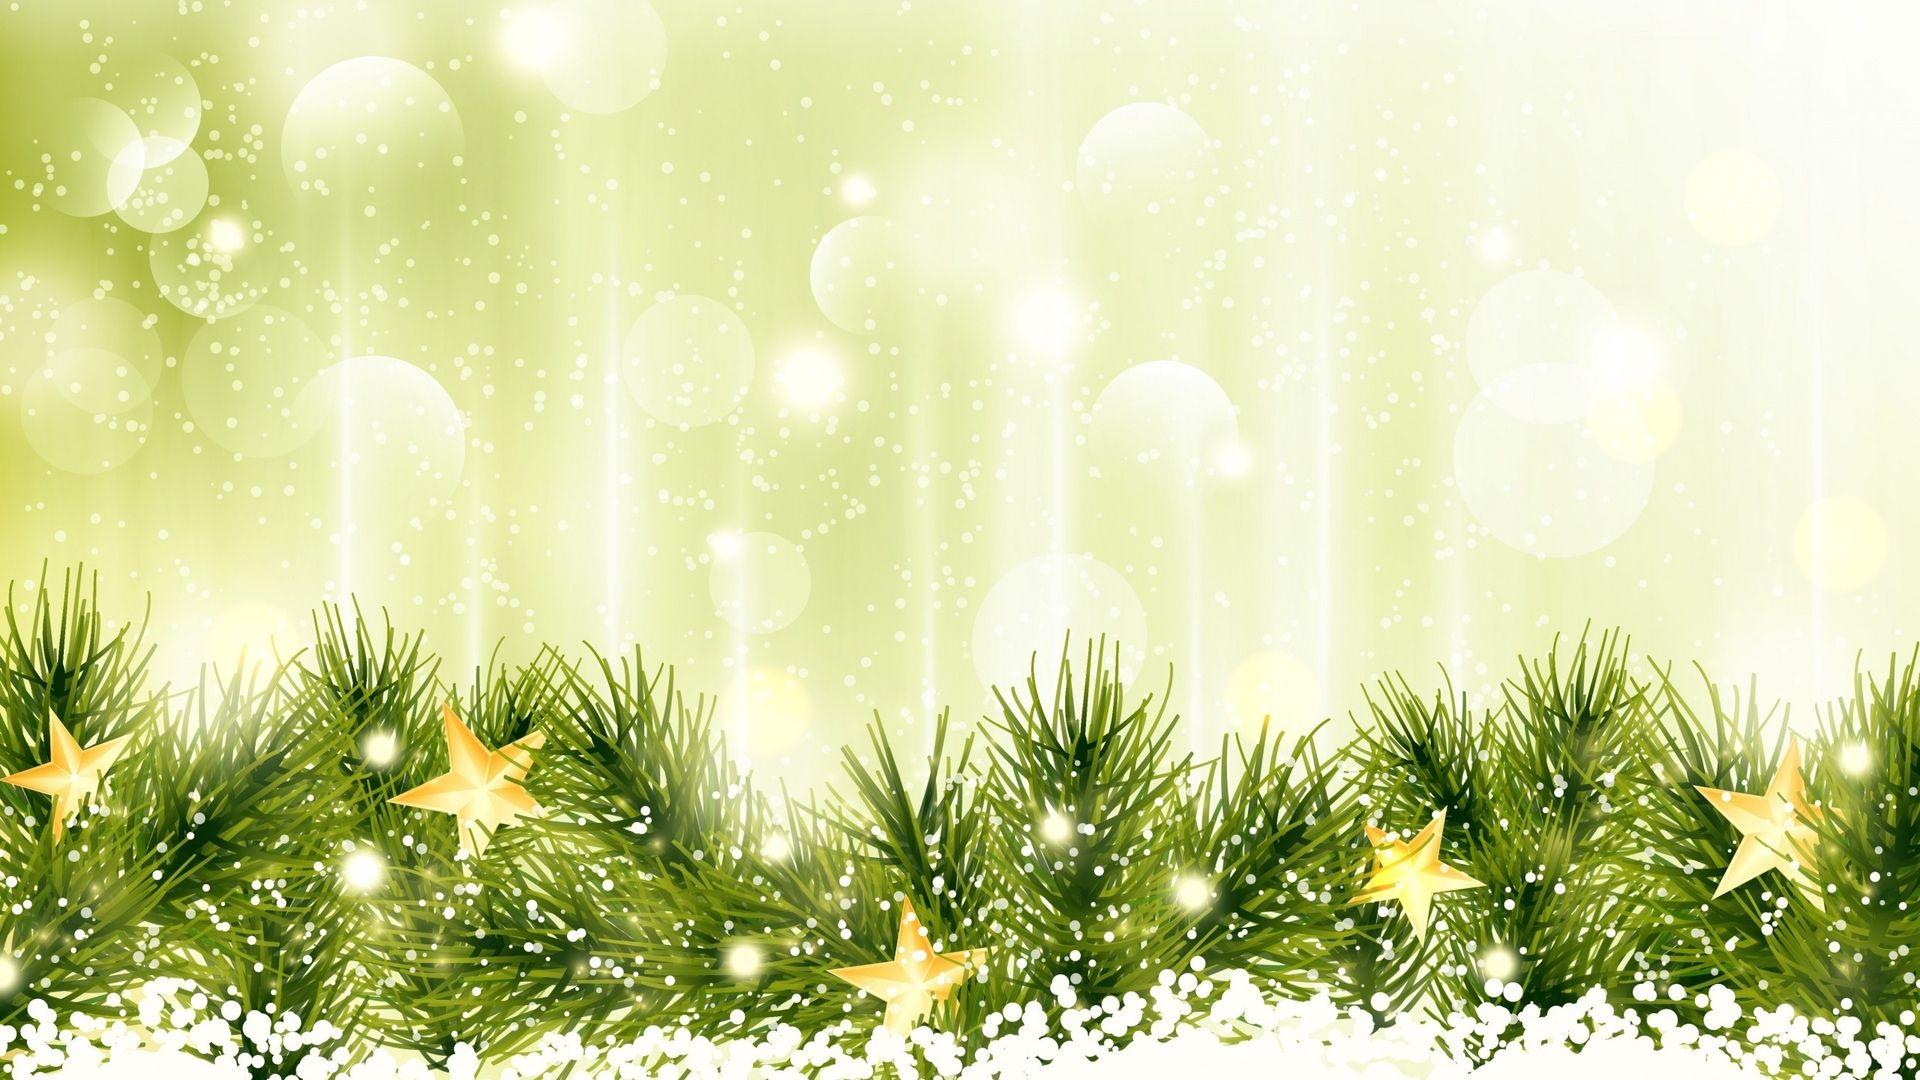 Christmas For Website Background Wallpaper